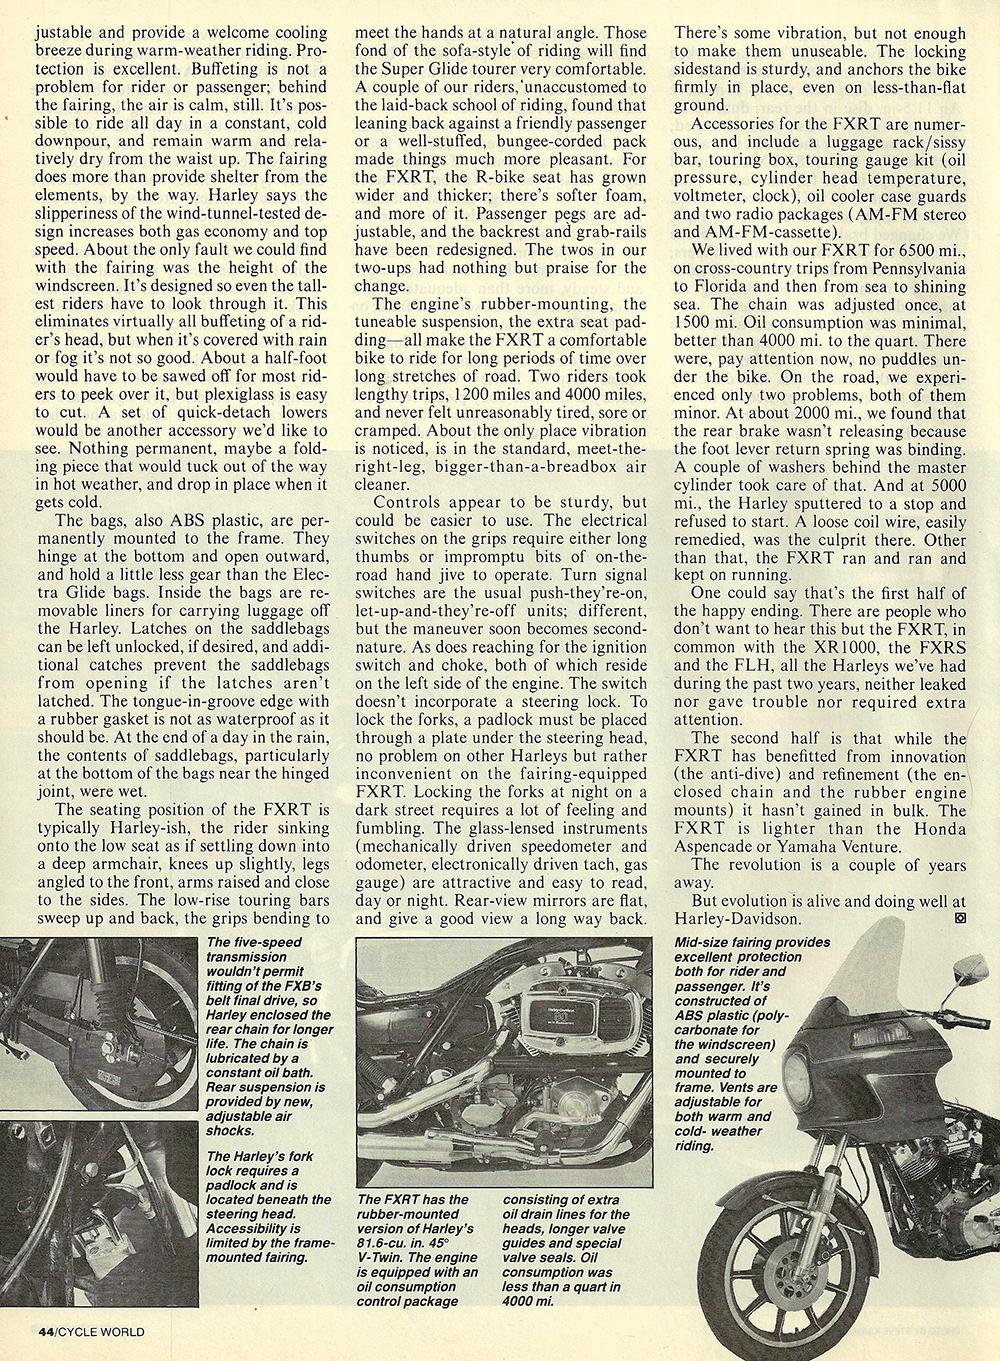 1983 Harley-Davidson FXRT road test 05.jpg